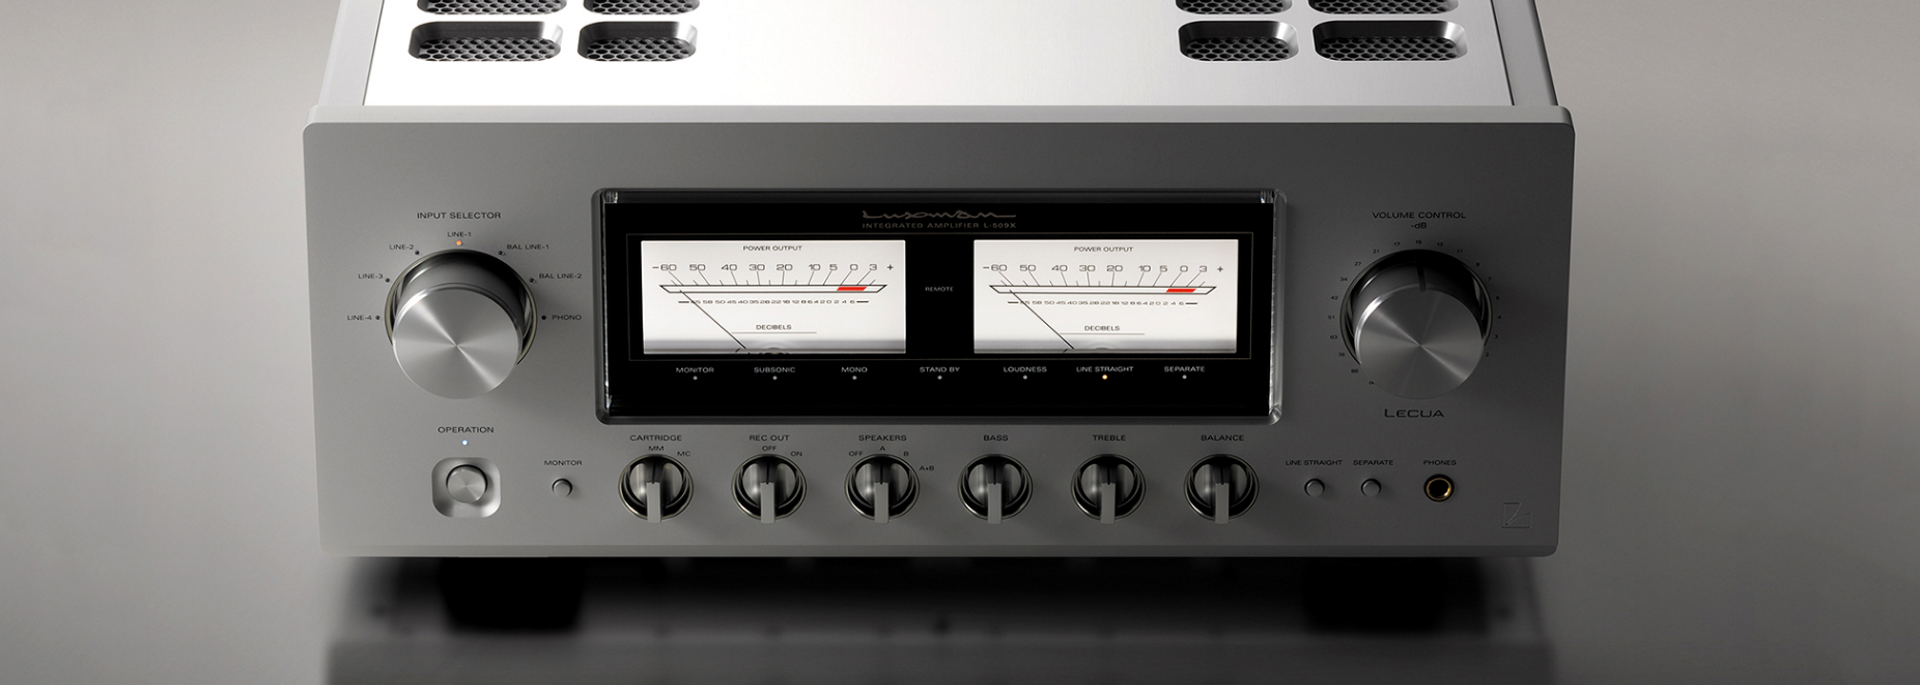 Luxman 590x